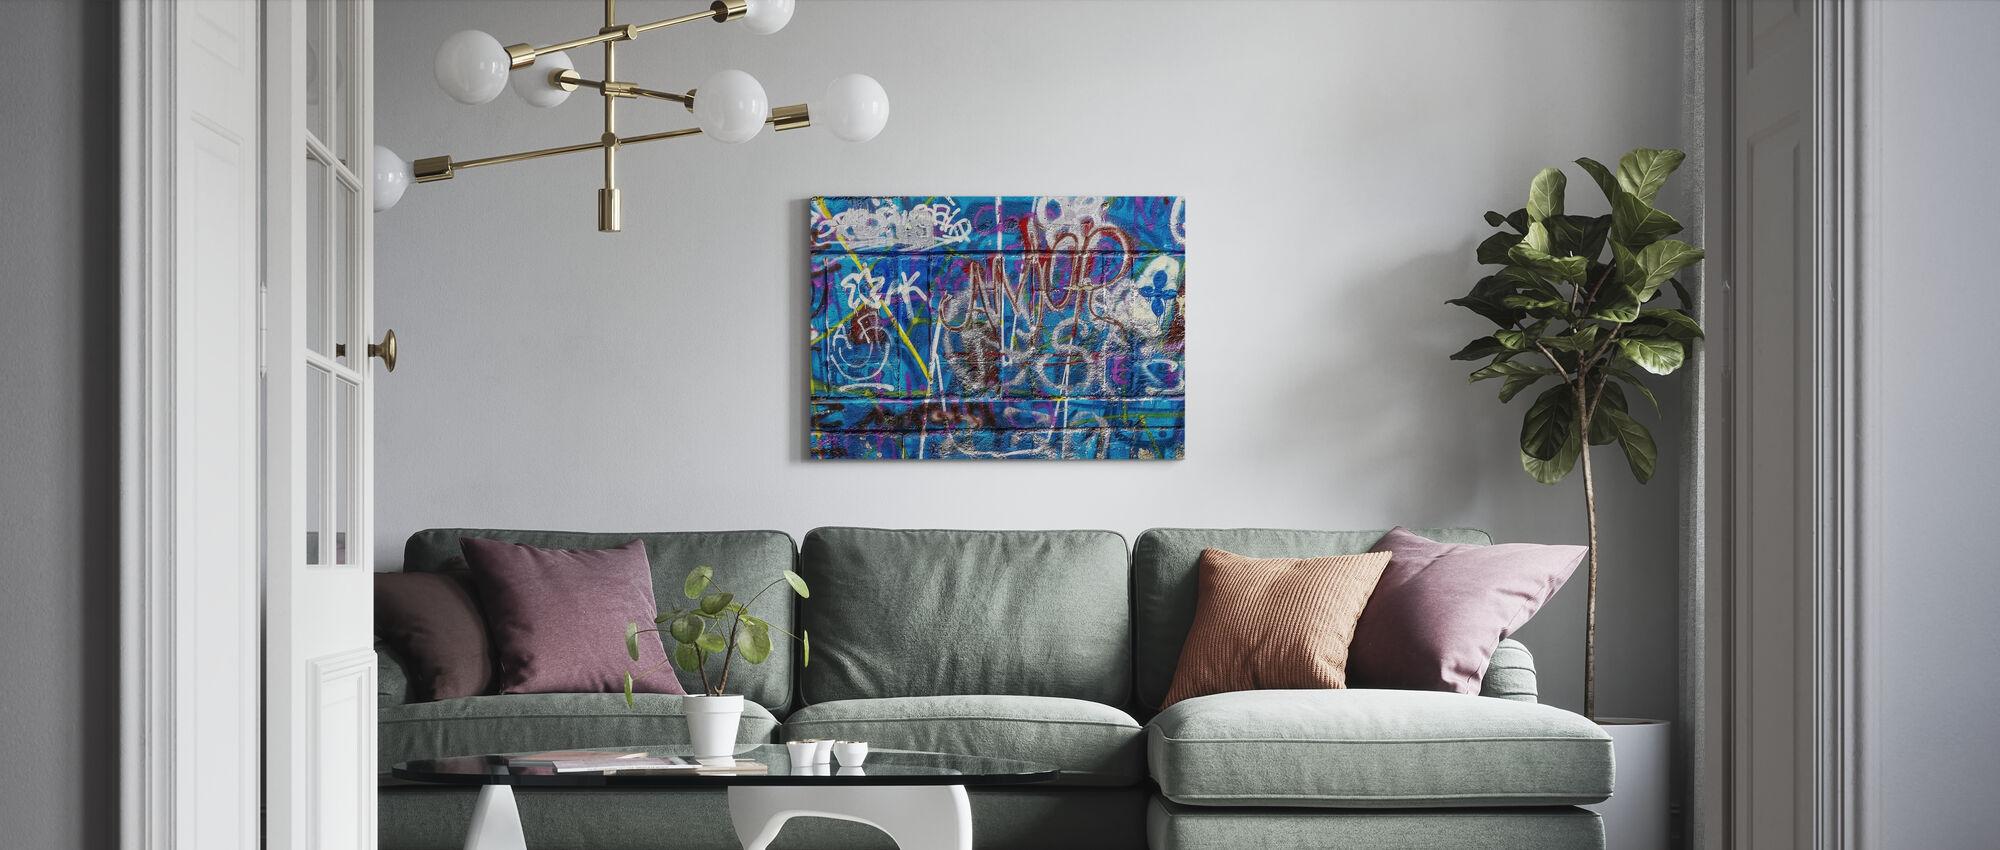 Wall Street Art - Canvastaulu - Olohuone